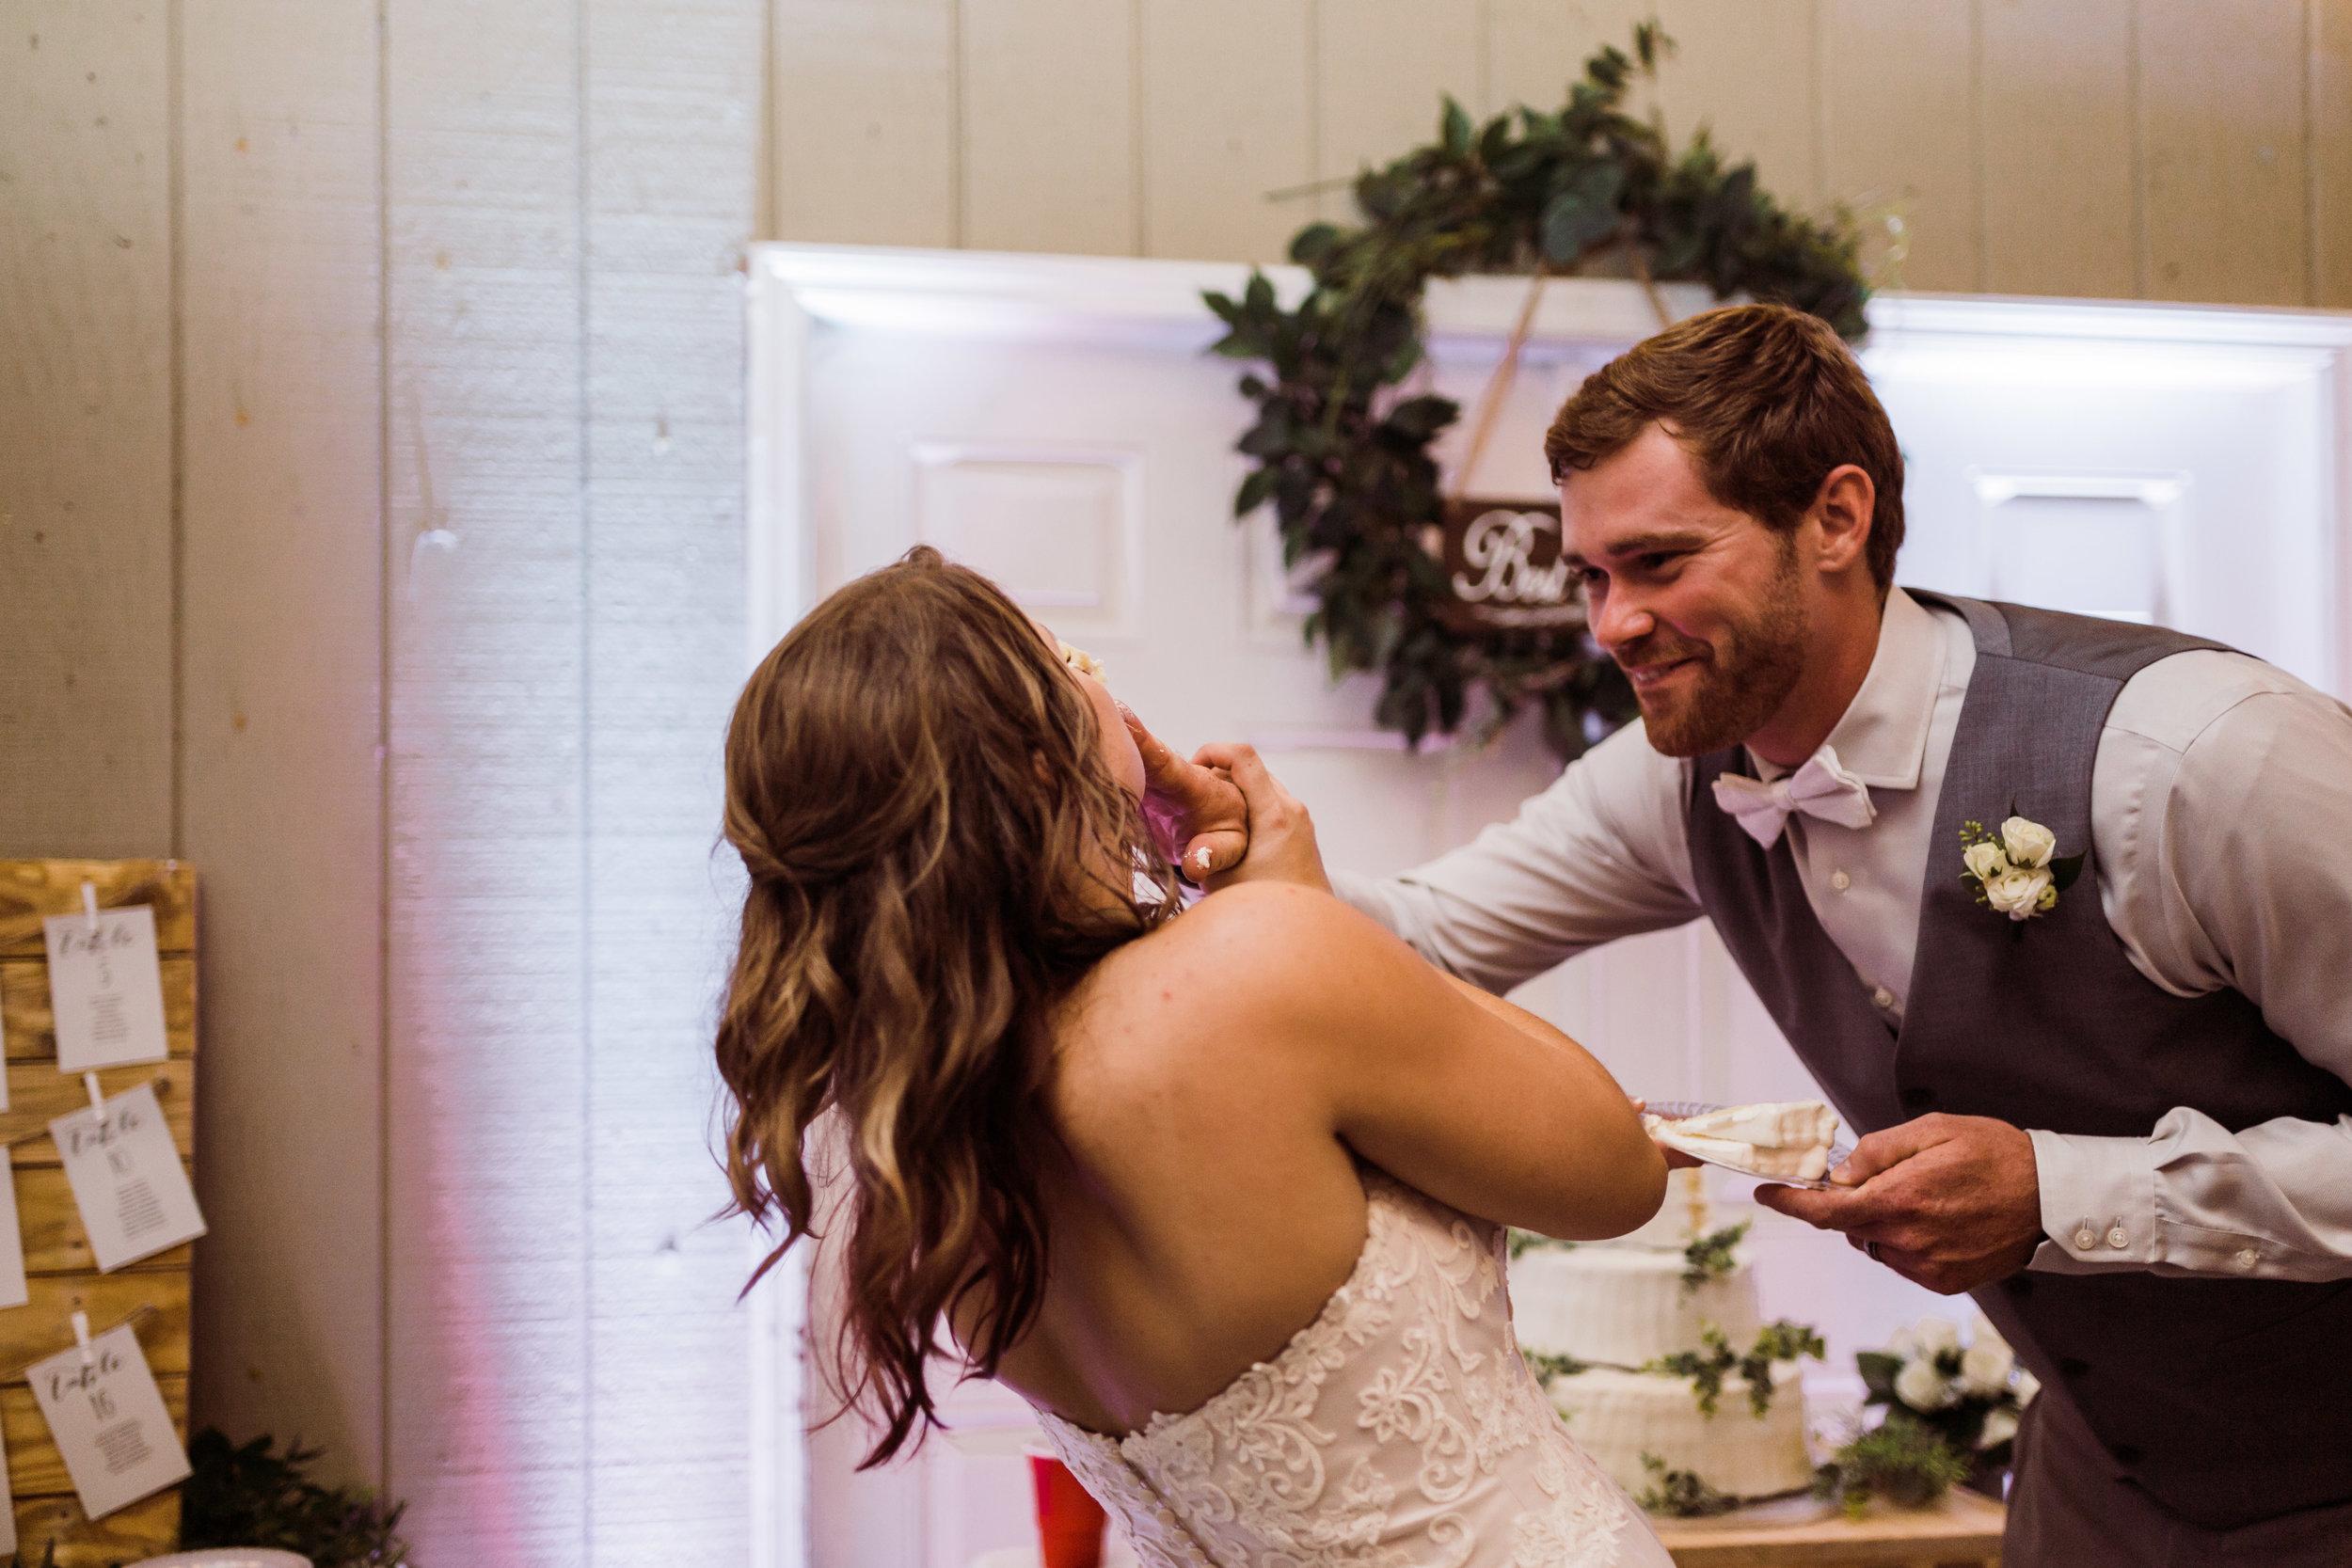 2017.10.14 Samantha and Matthew Crabtree Sarasota Wedding (548 of 708).jpg